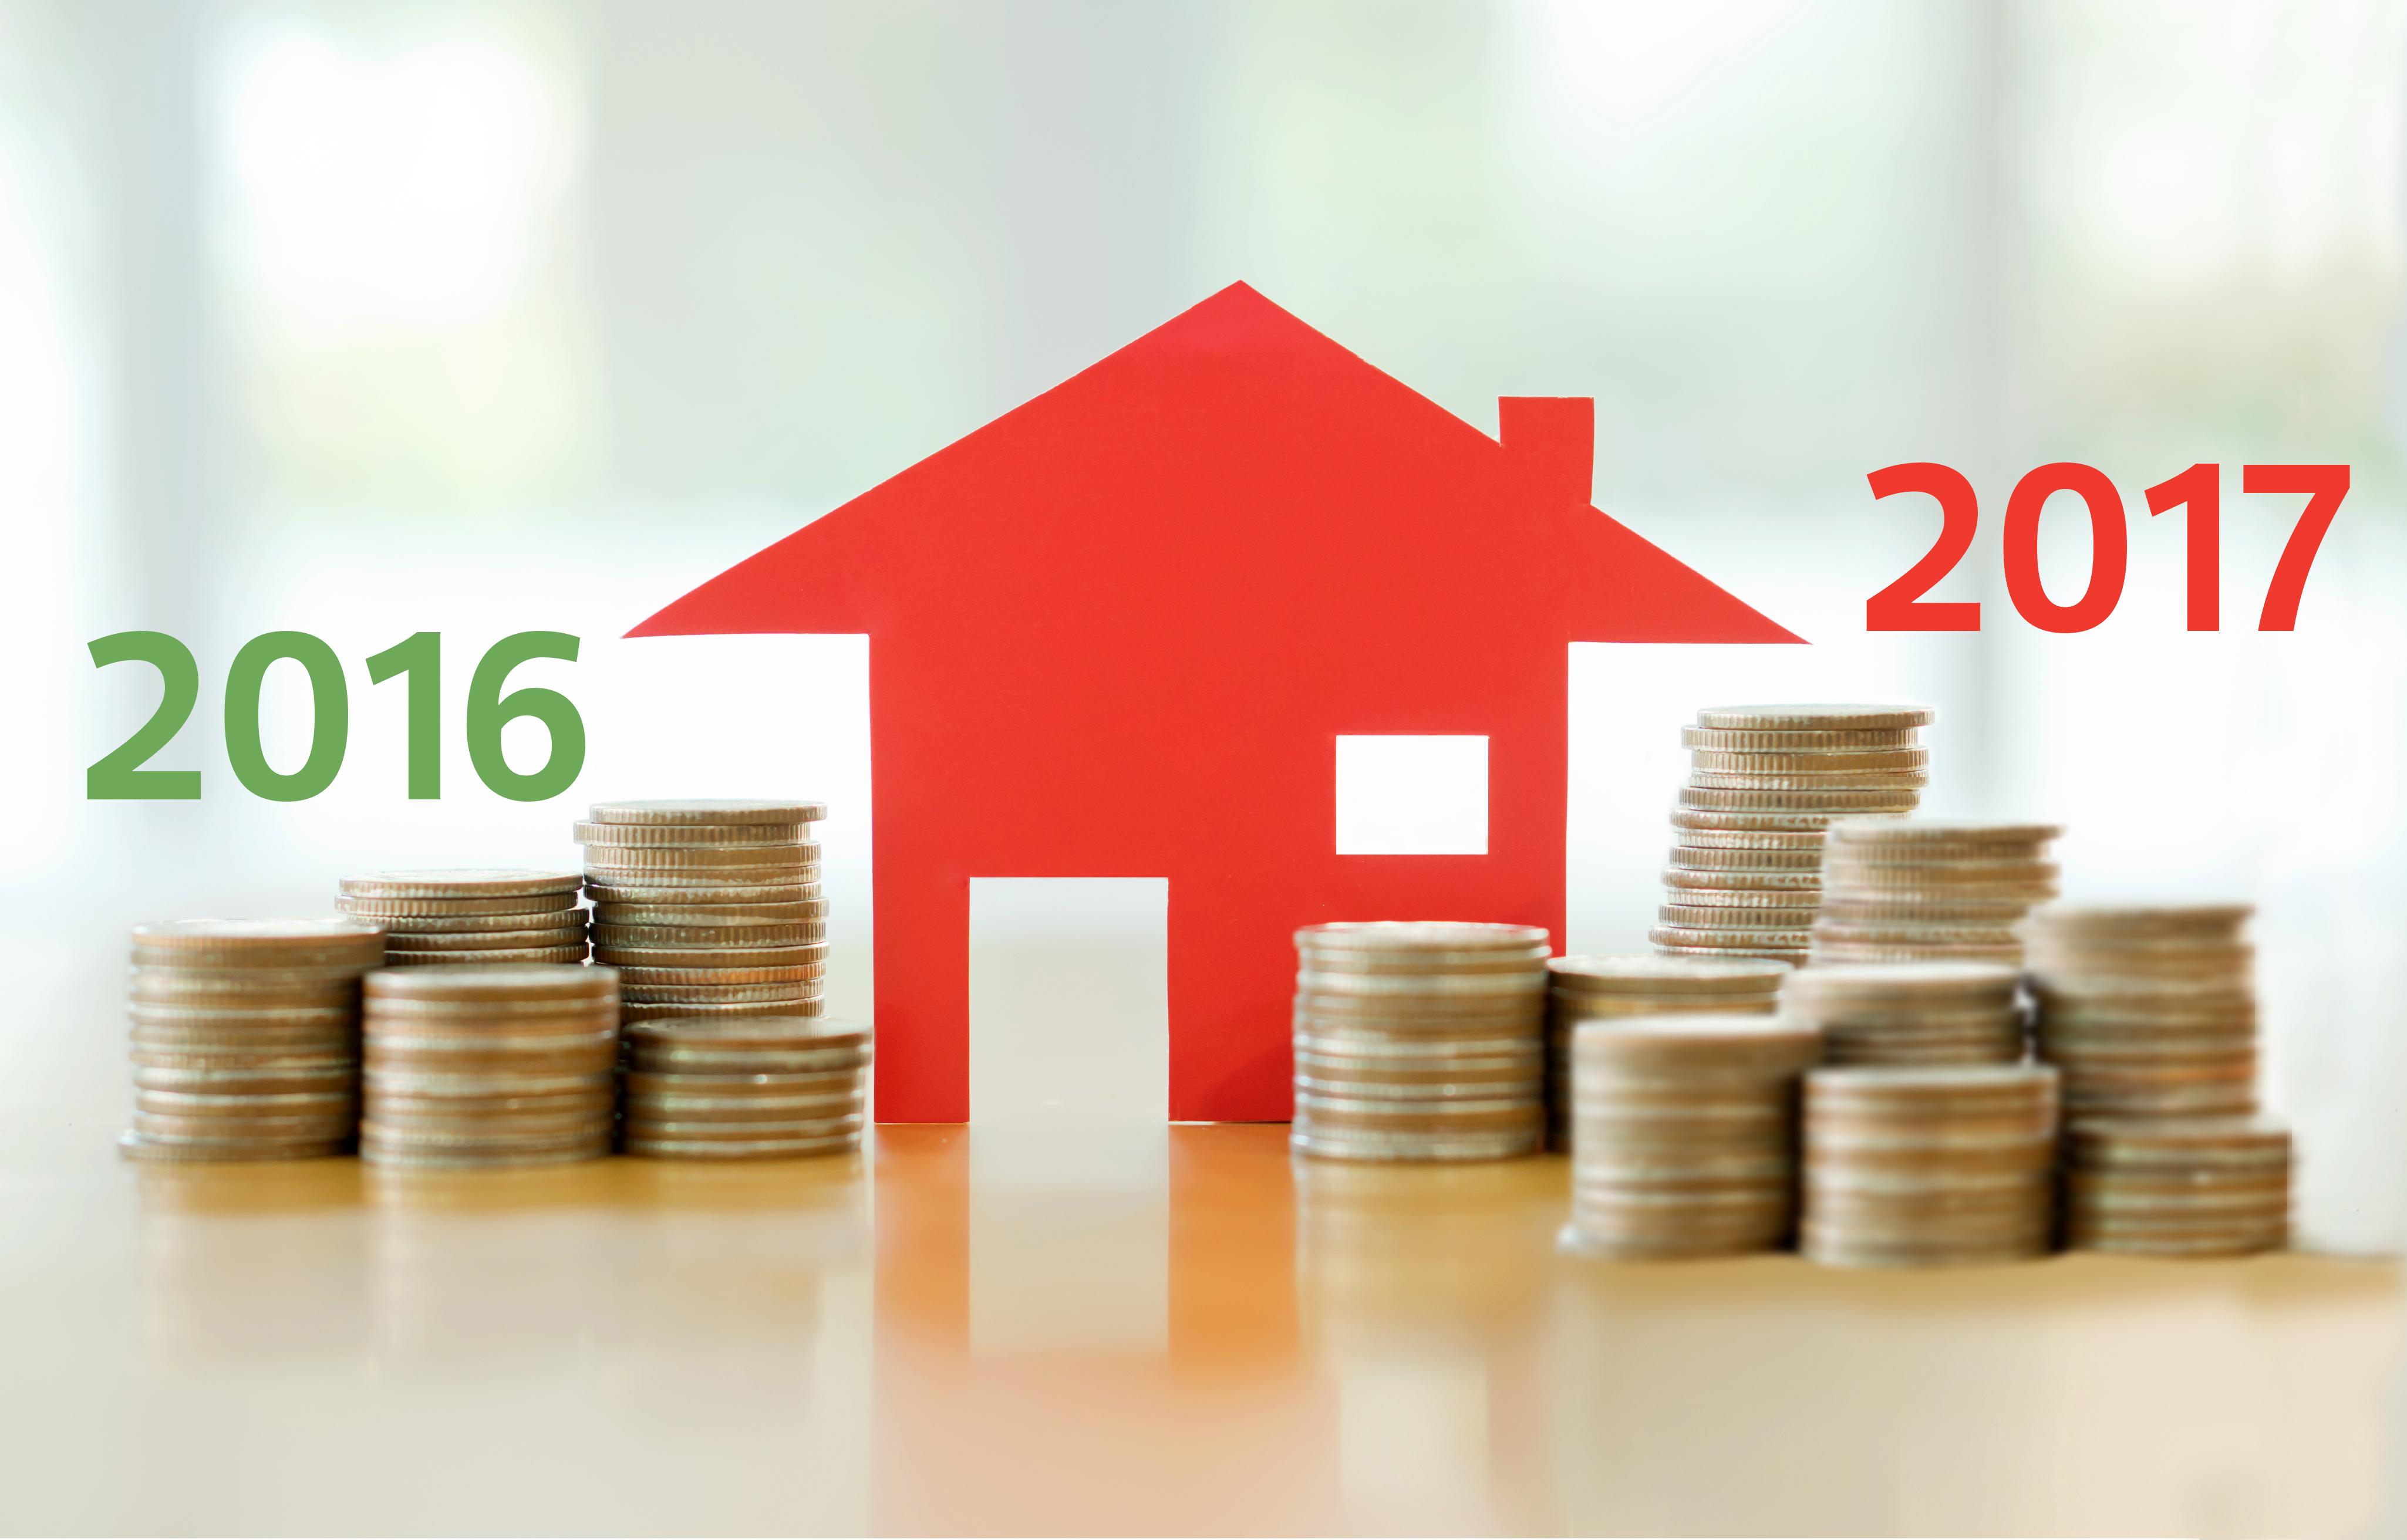 emprunt hypothécaire Bruxelles 2016 2017